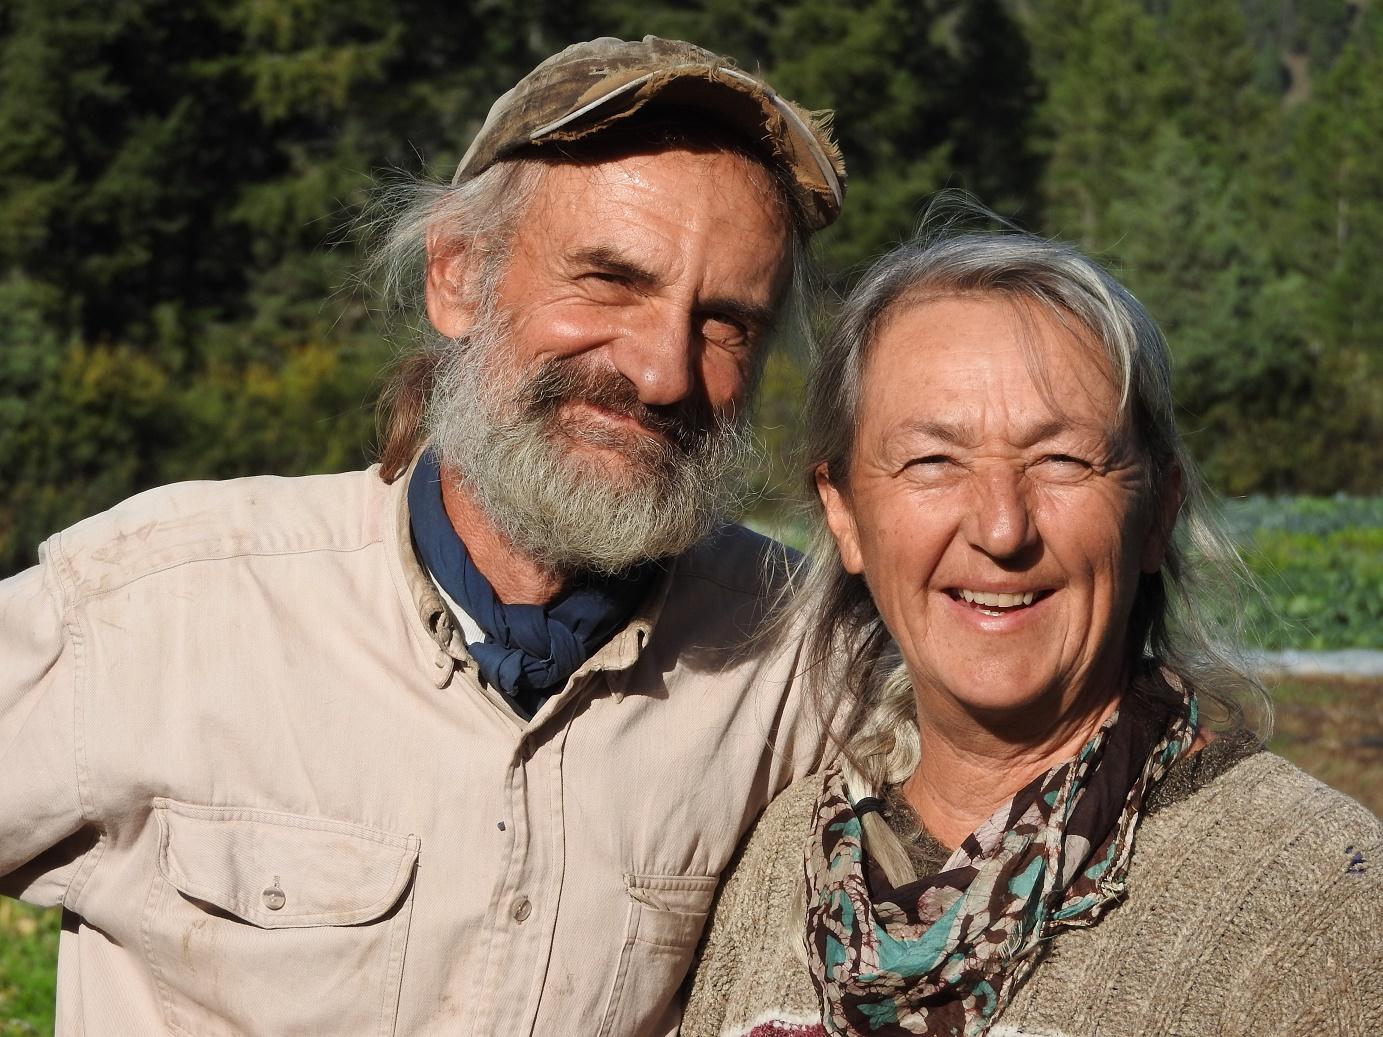 Mackin Creek Rob & Cathie 1